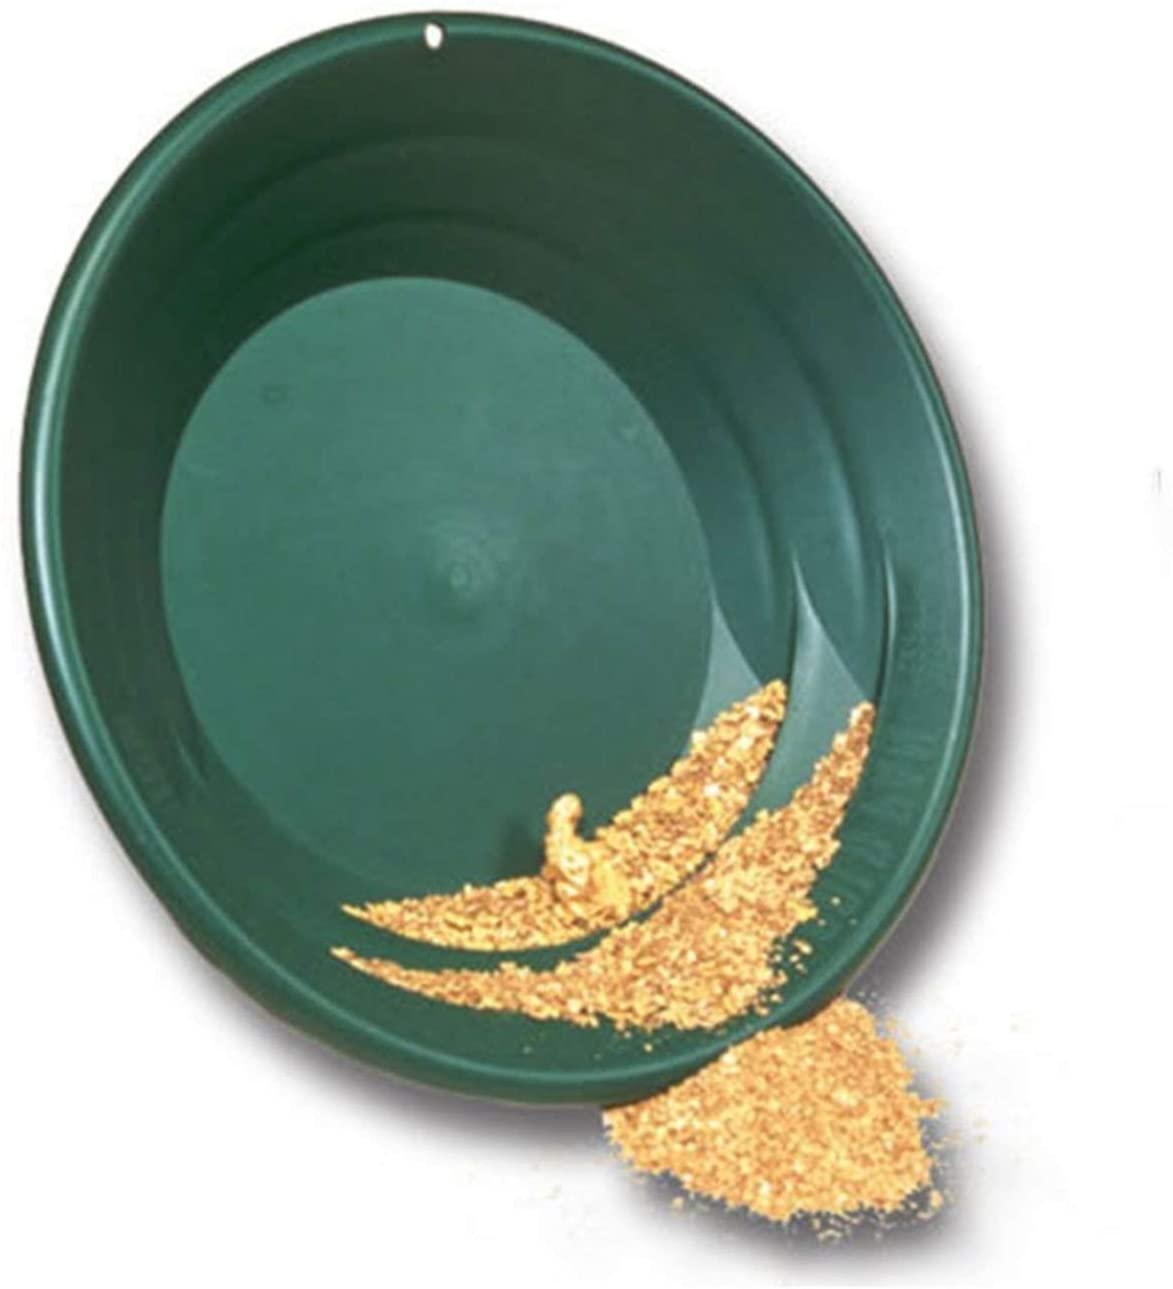 Supersluice Gold Pan, 15